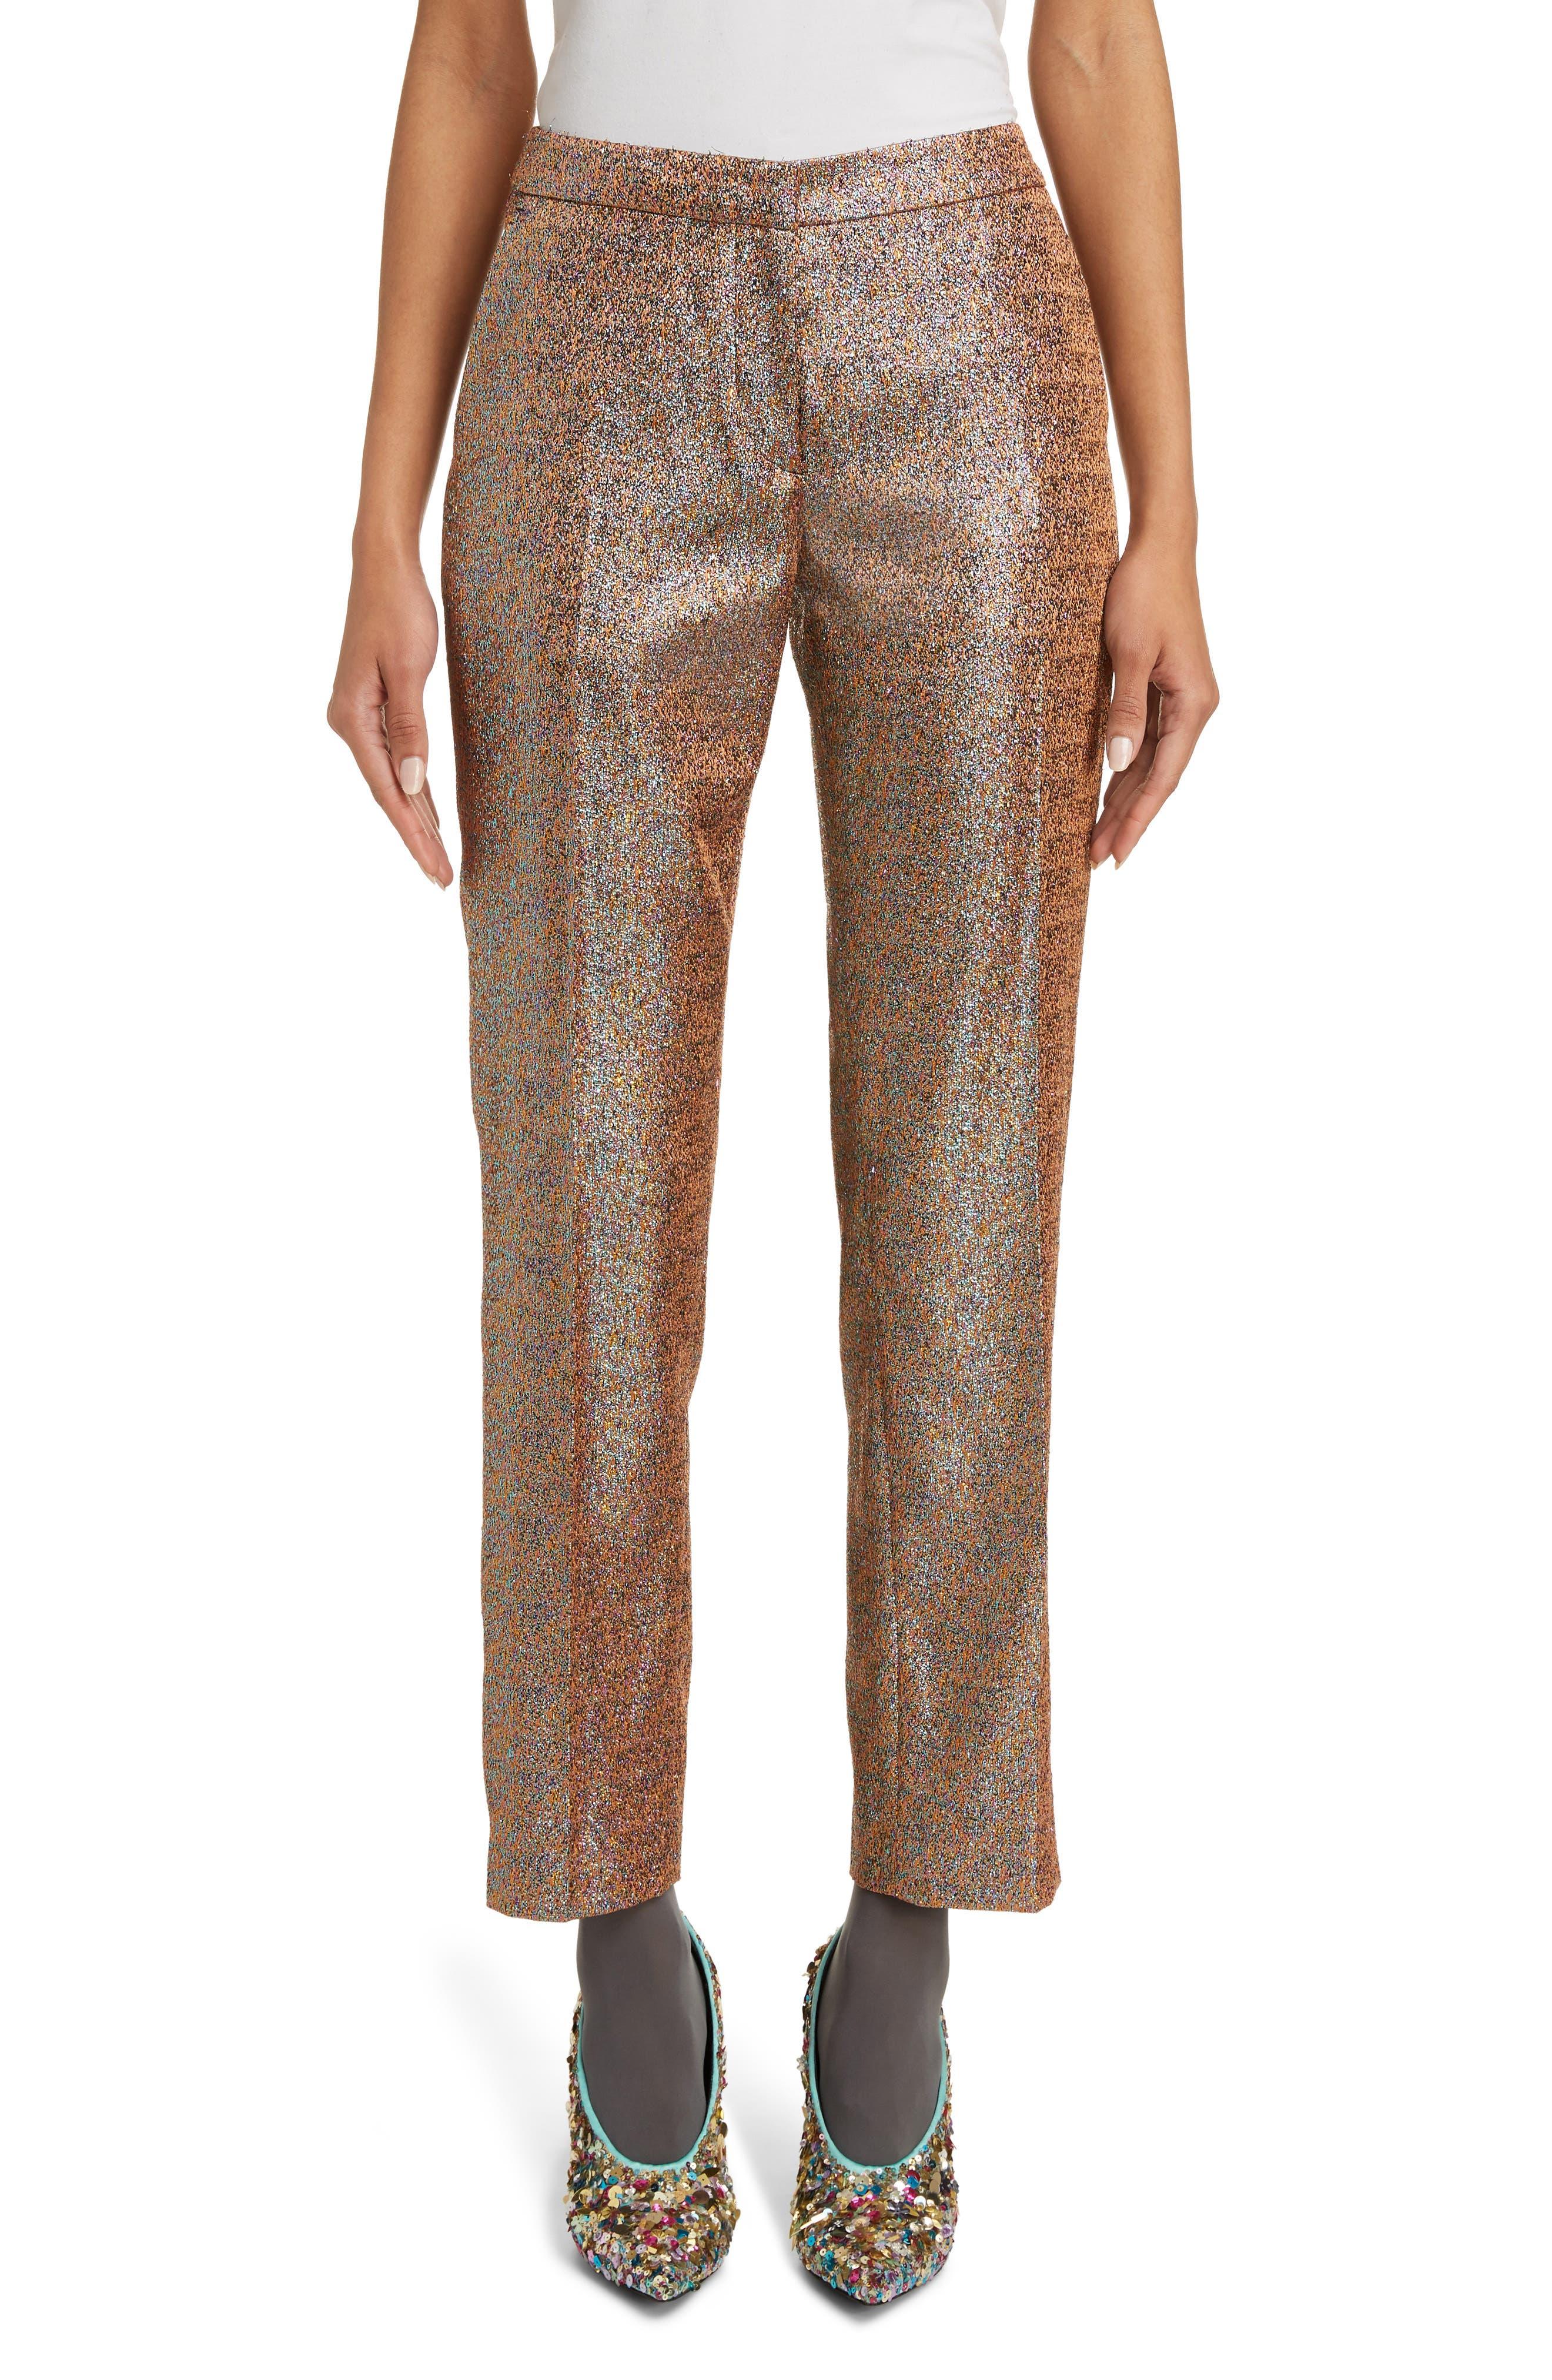 Dries Van Noten Pants Poumas Metallic Ankle Trousers